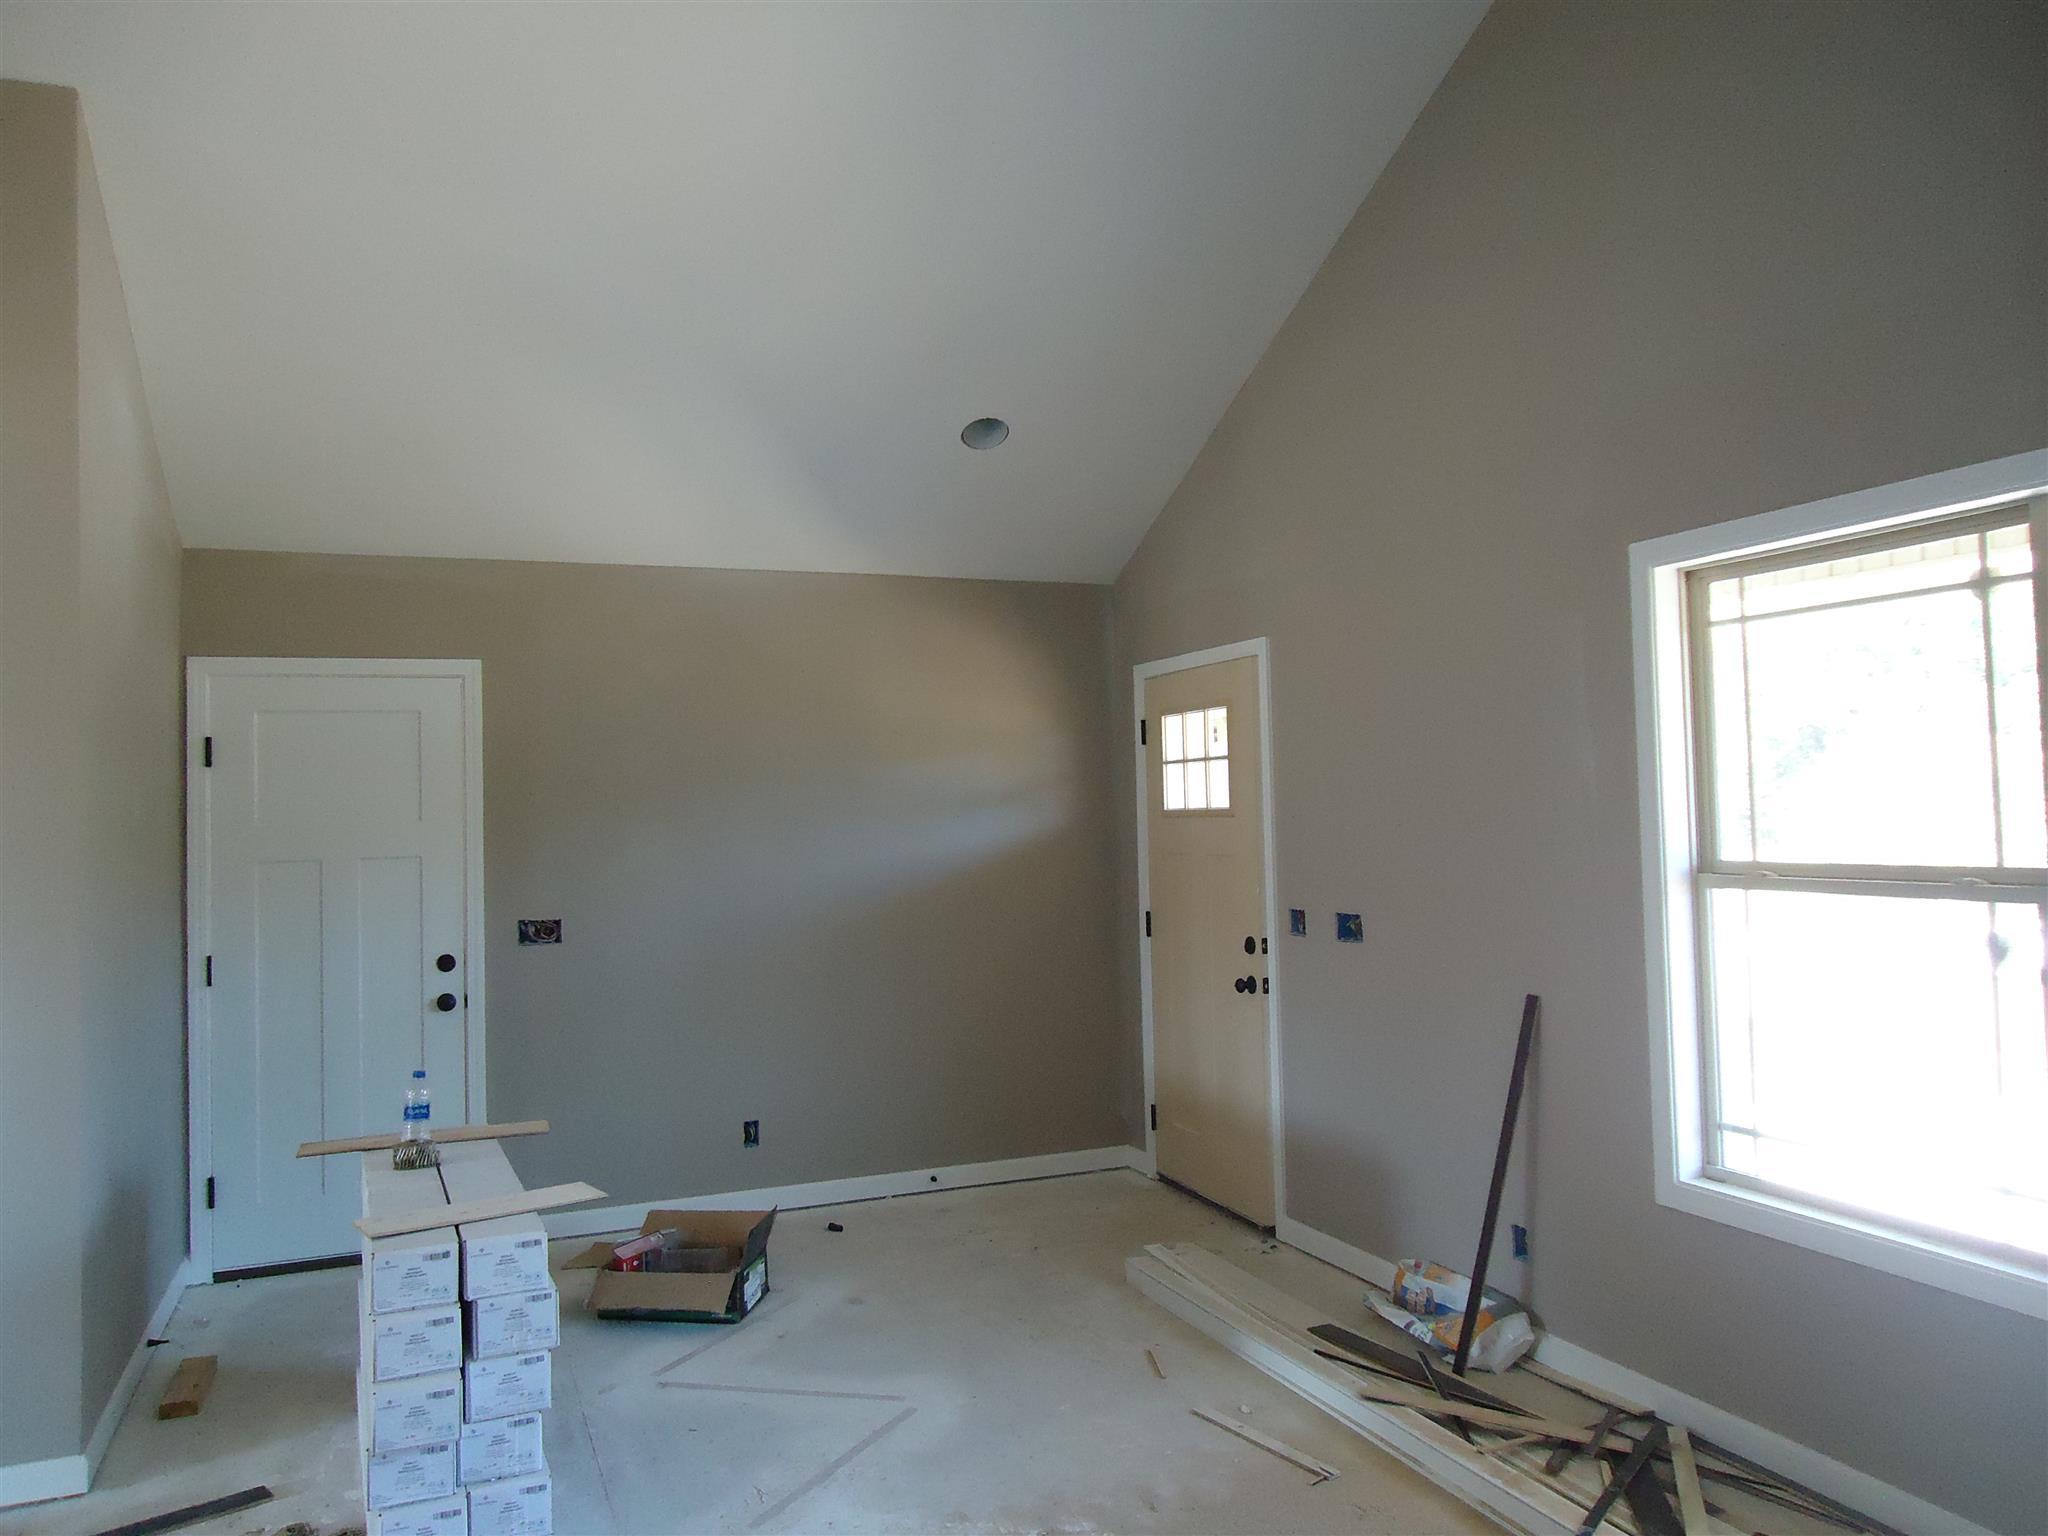 77 Shawna Lane, Hillsboro, TN 37342 - Hillsboro, TN real estate listing